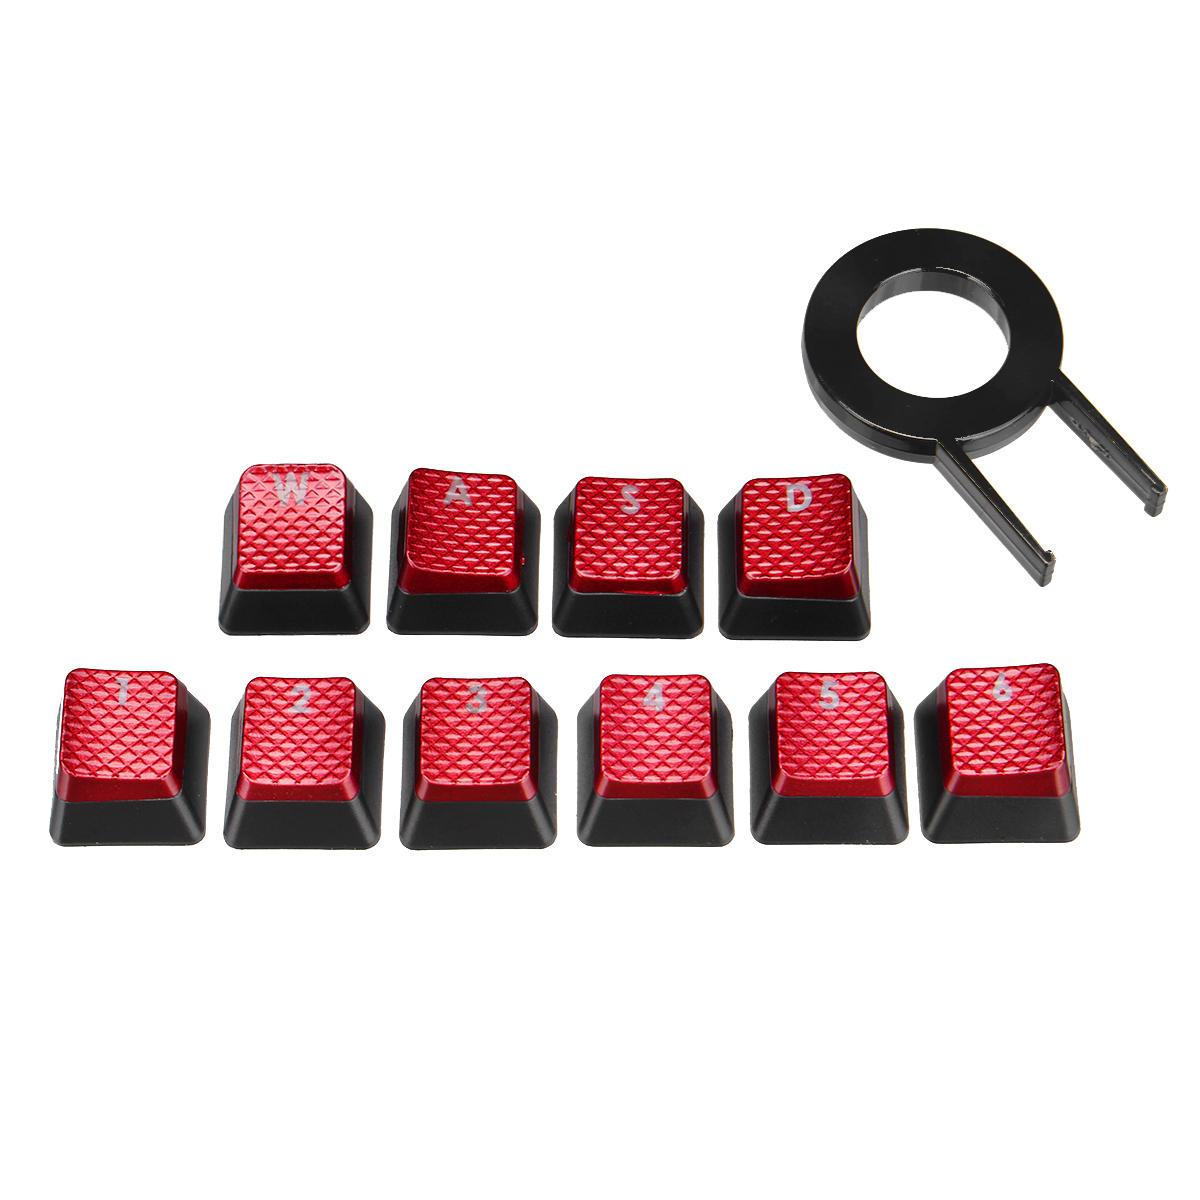 10 Key Backlit Translucent WASD Keycap Key Cap for MX Switch Mechanical Keyboard for Corsair FPS